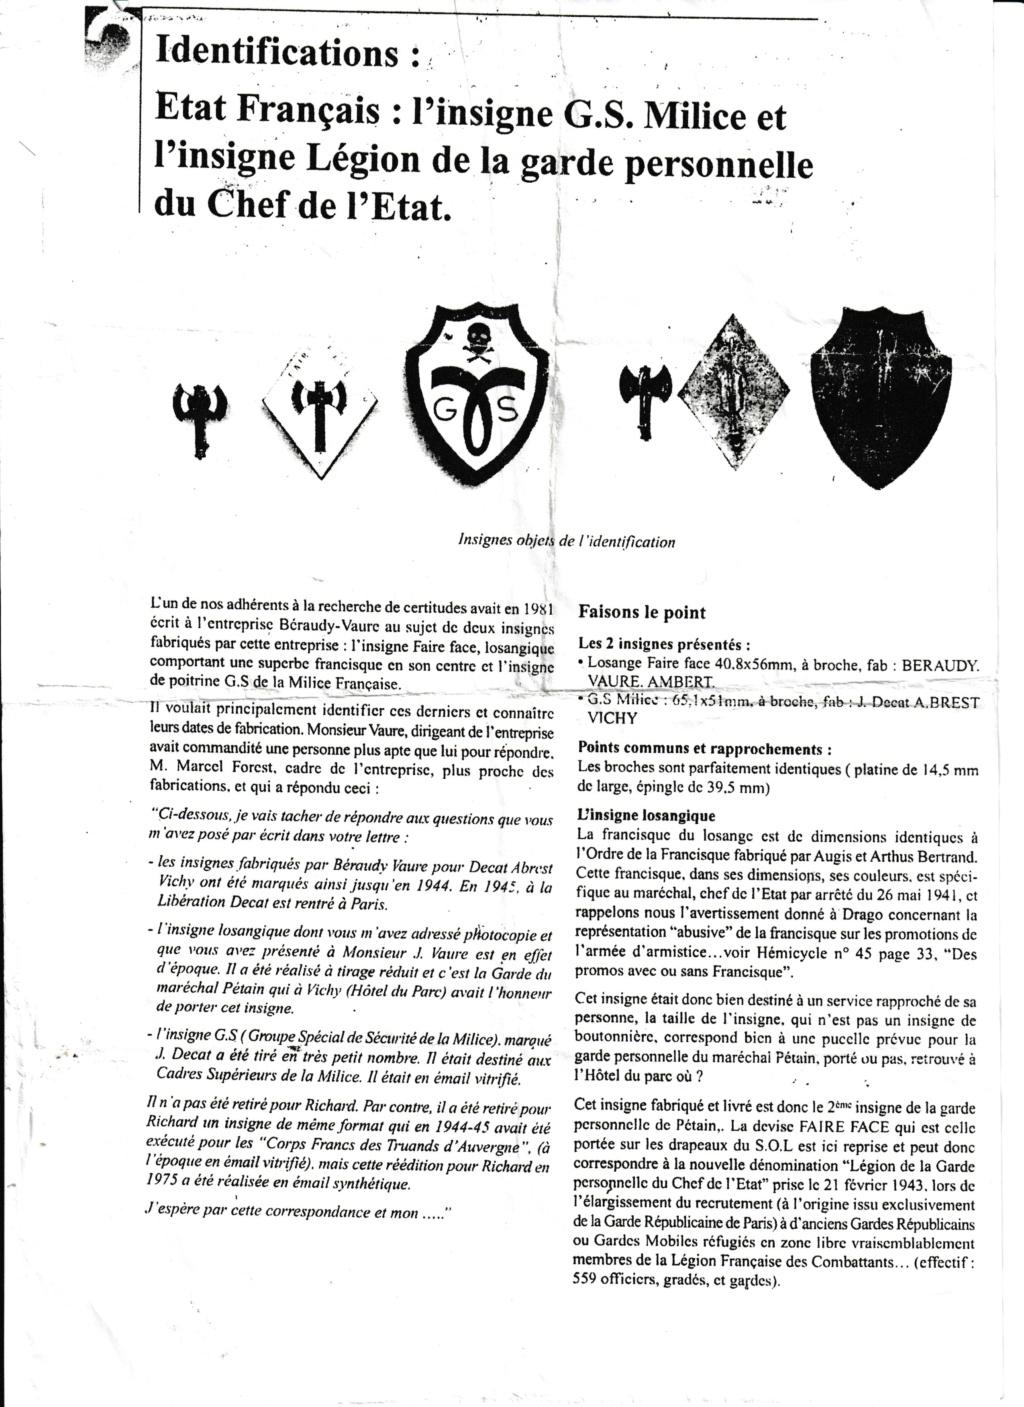 Identification d'un insigne G.S.S Milice Insign13